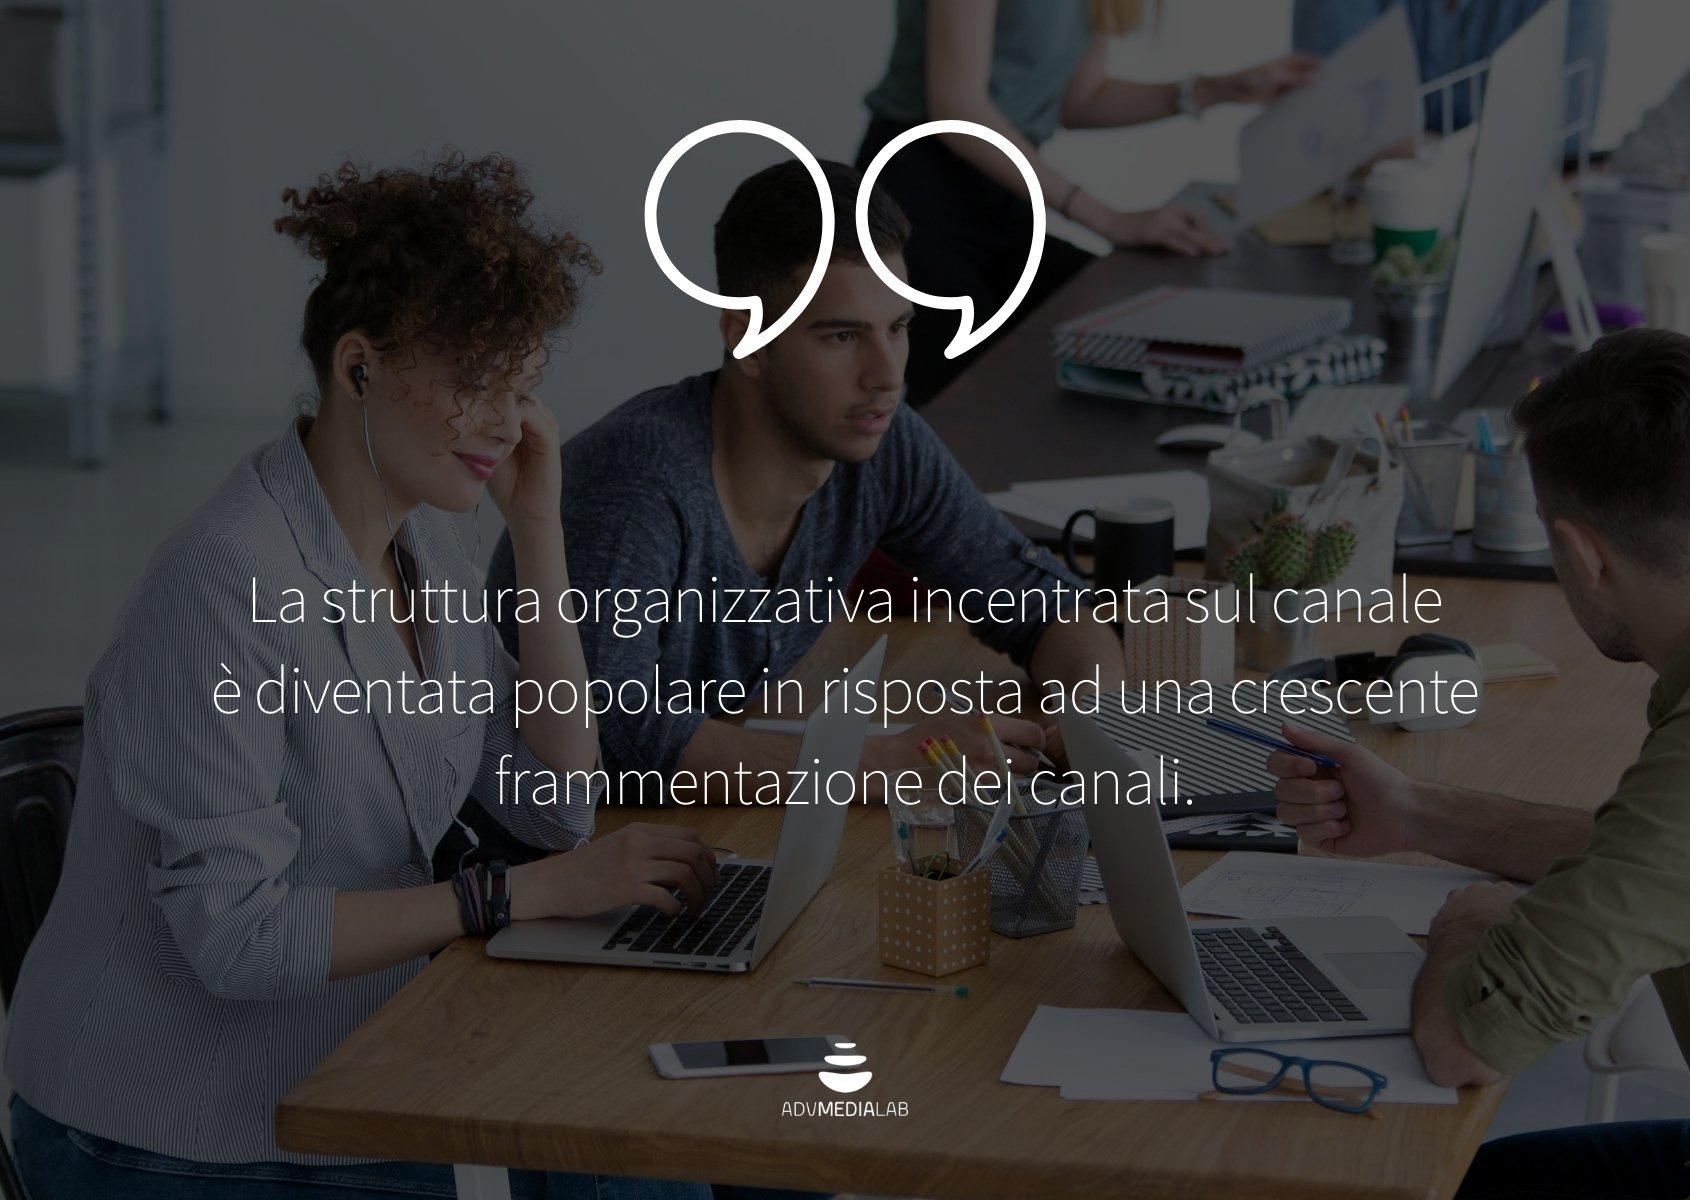 Marketing-team-quote1